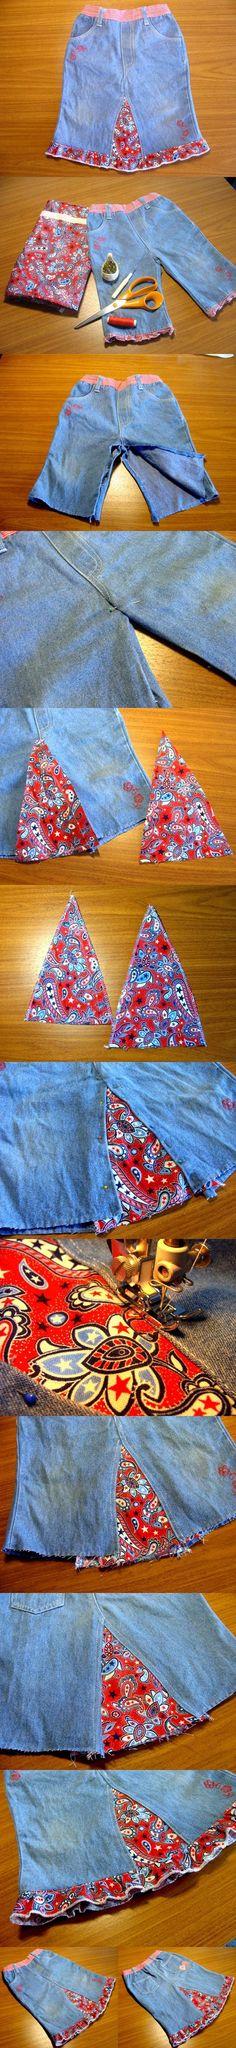 DIY Easy Skirt from Old Jeans | iCreativeIdeas.com LIKE Us on Facebook ==> https://www.facebook.com/icreativeideas